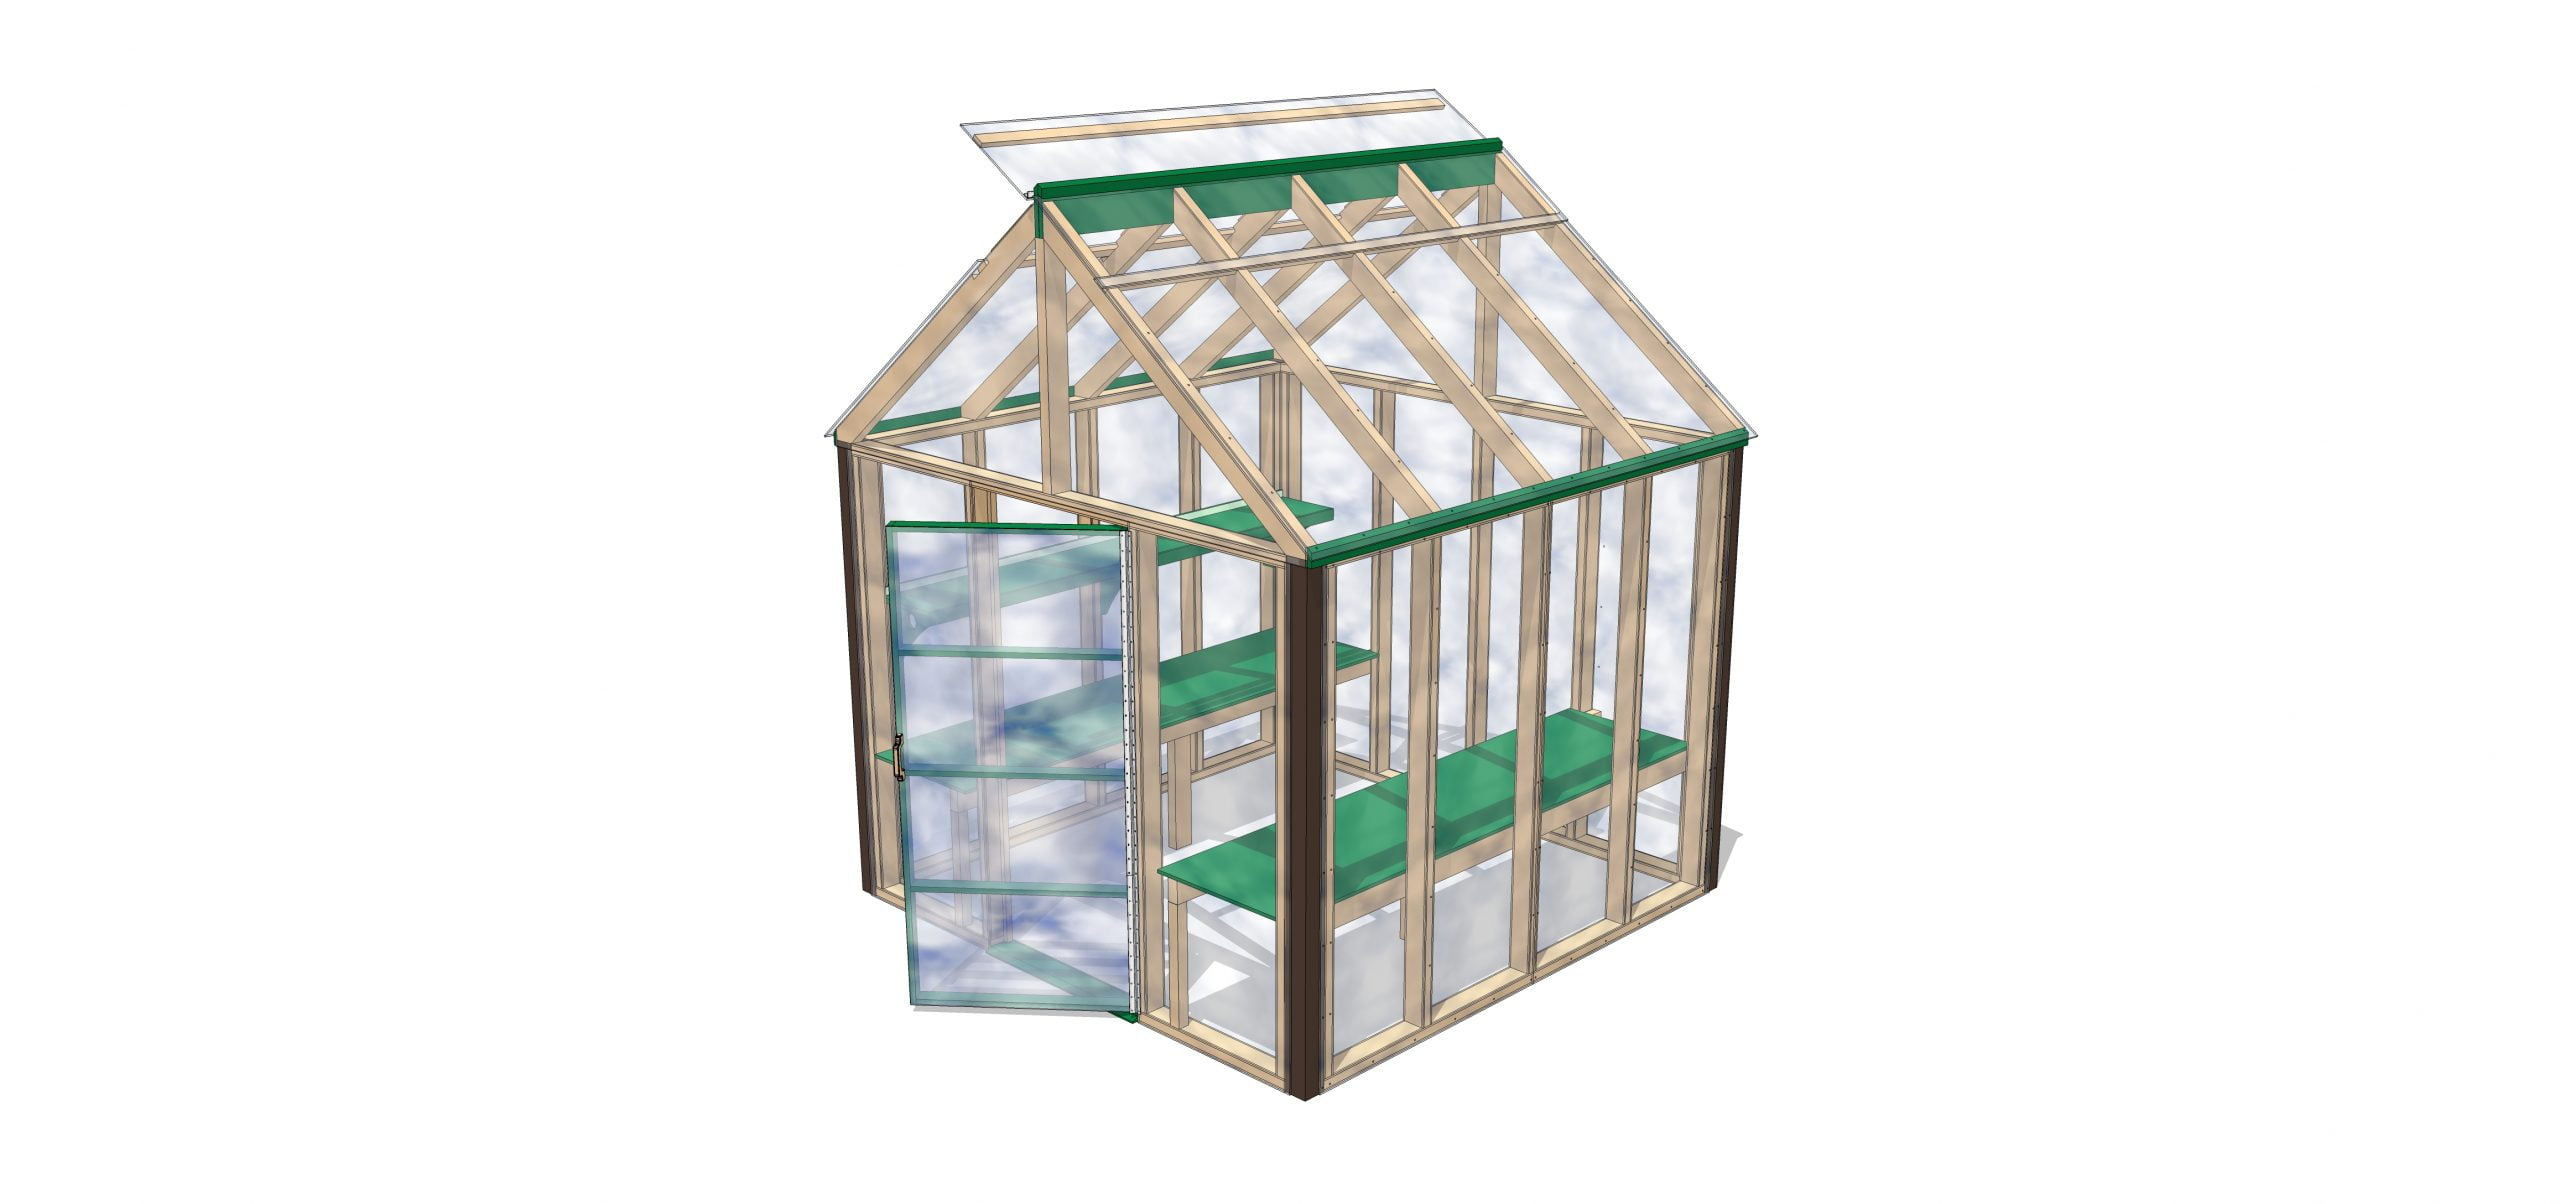 1 8X8 NEW GREENHOUSE - MAIN MODEL